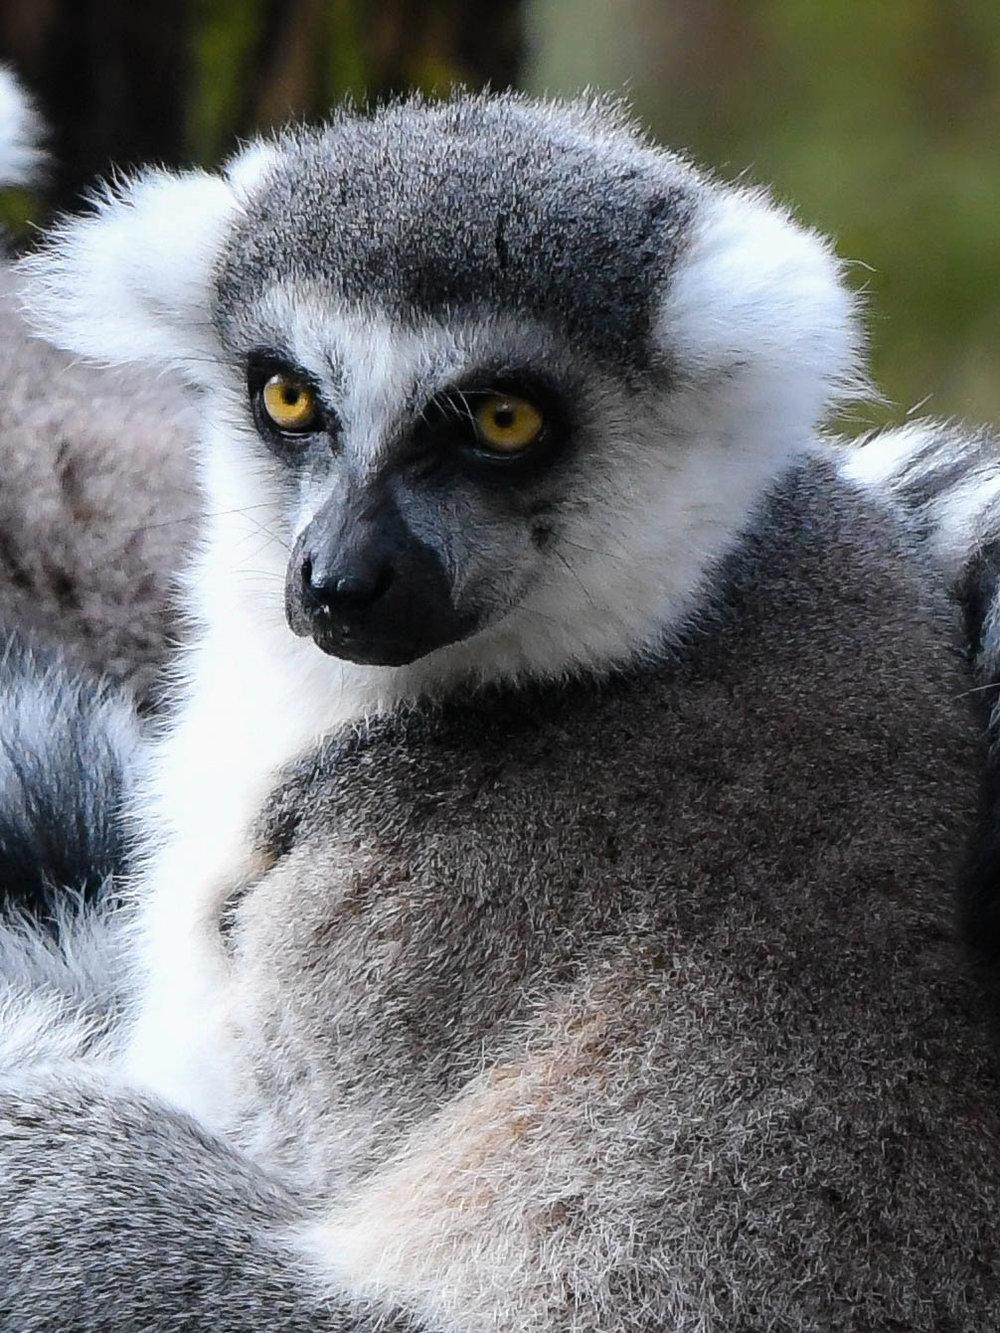 Copy of Lemur, Woodland Park Zoo, 2018